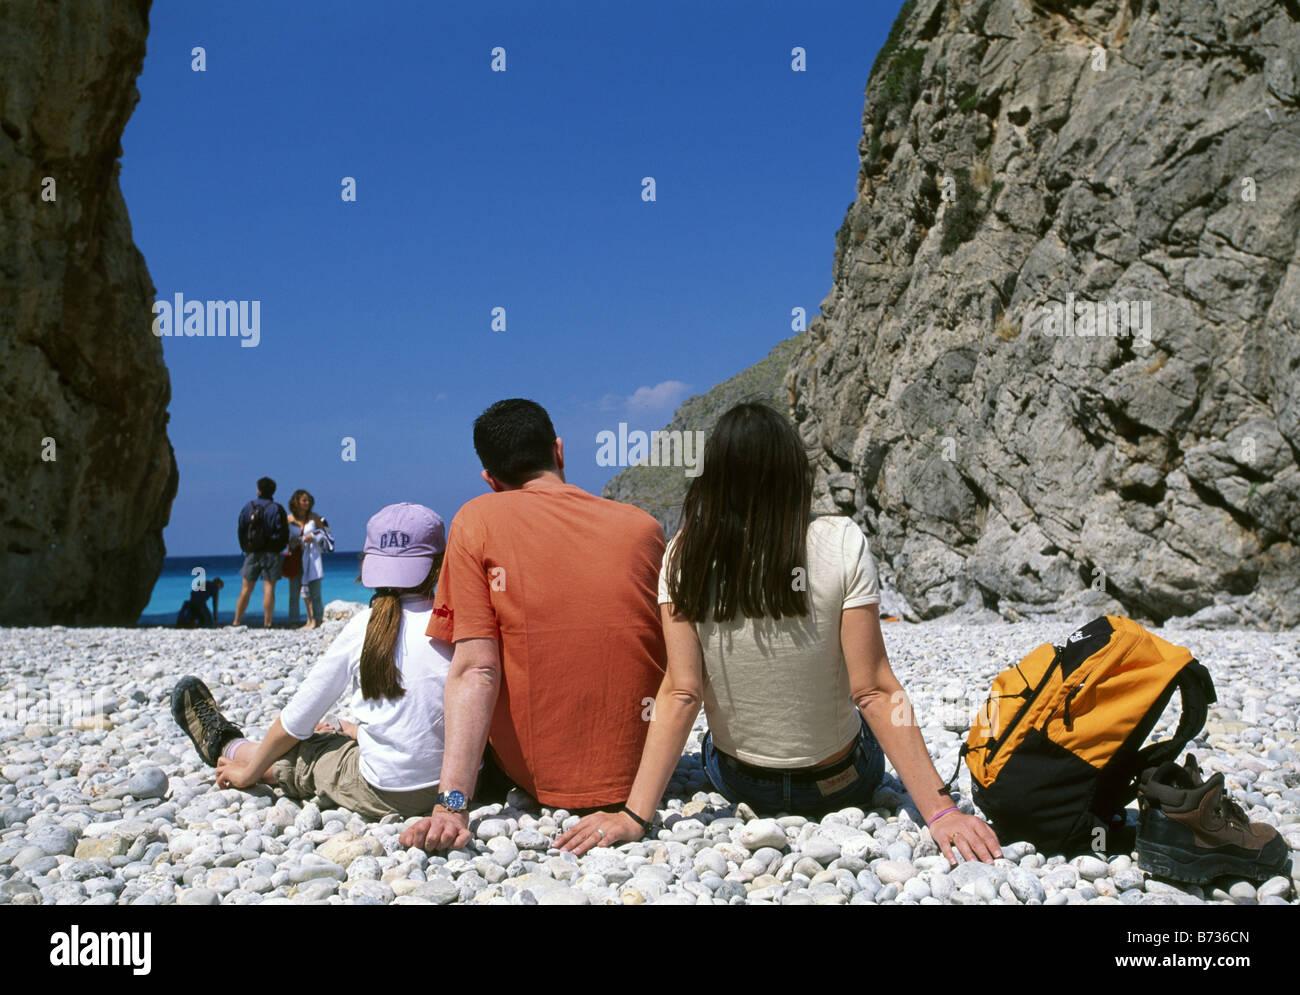 Sa Calobra Majorca Balearic islands Spain - Stock Image